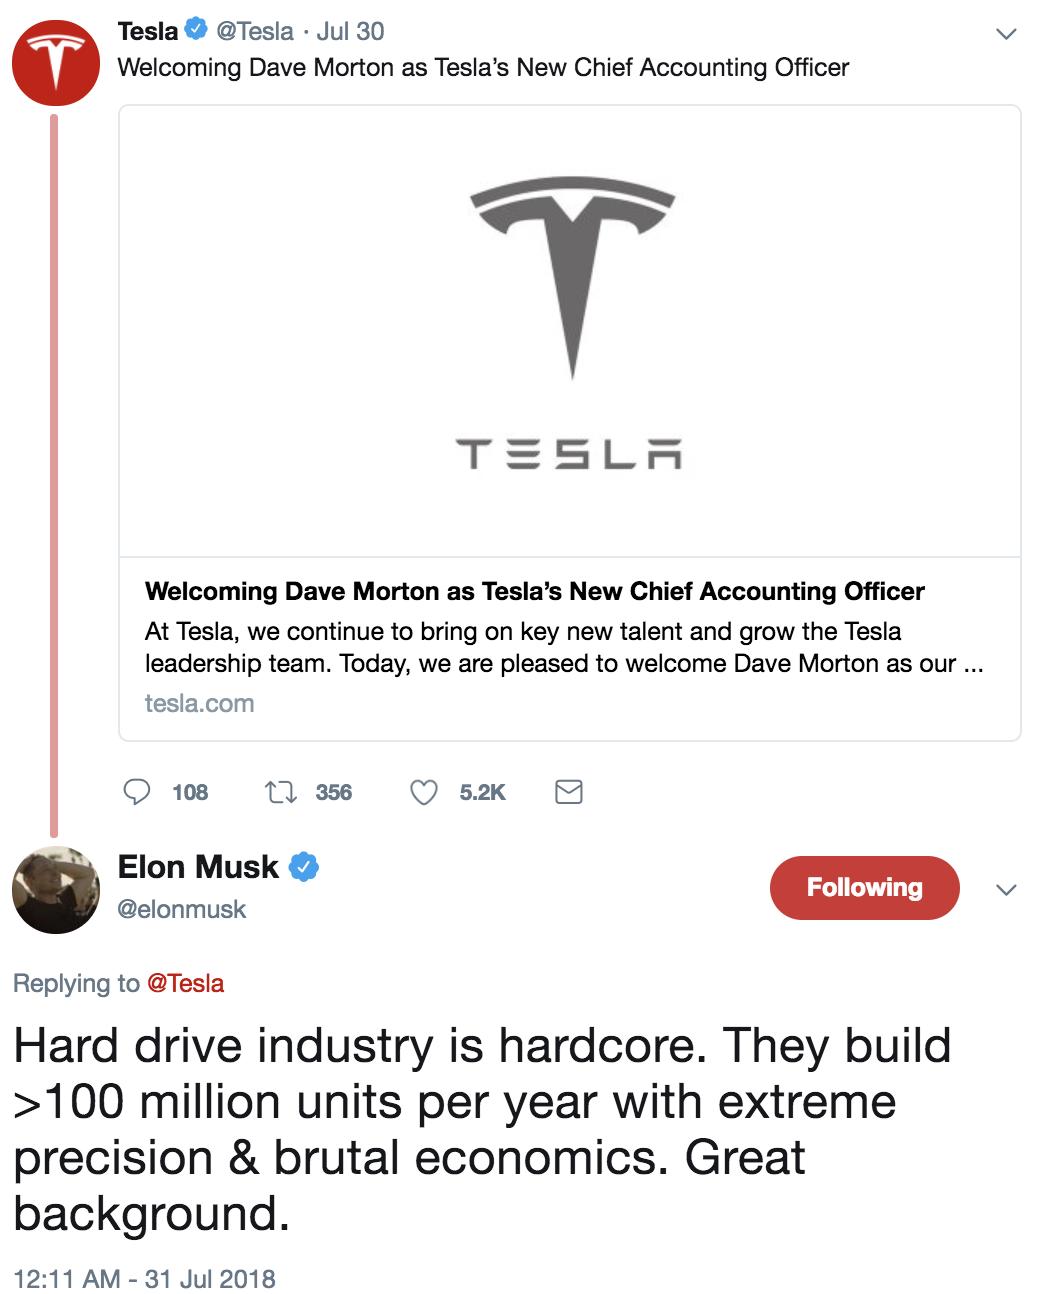 Tesla's Finance And Accounting Executive Exodus - Tesla, Inc